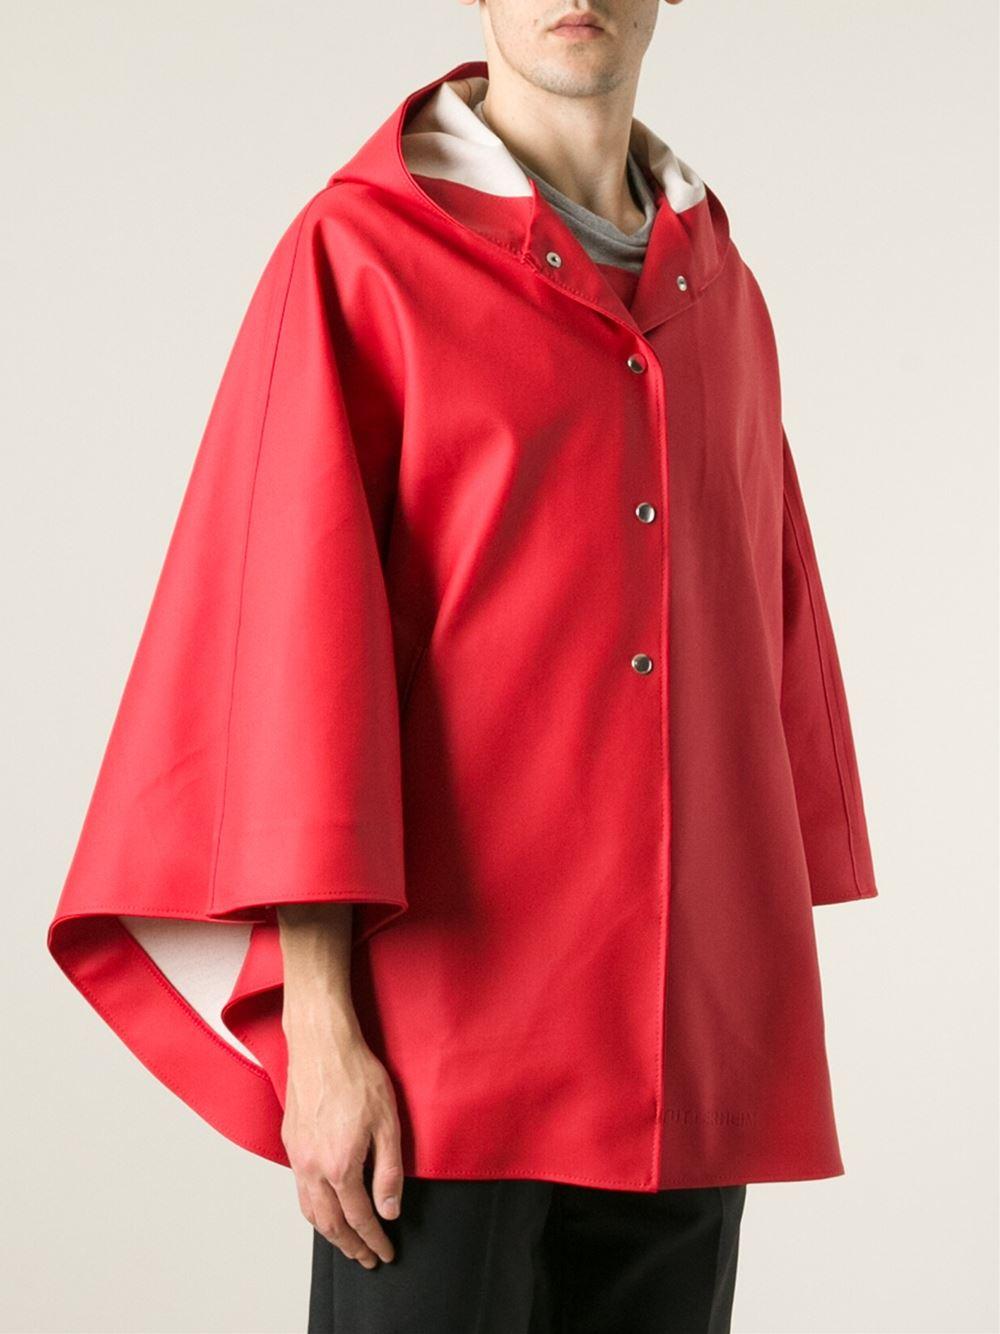 Stutterheim Oland Raincoat Cape In Red Lyst